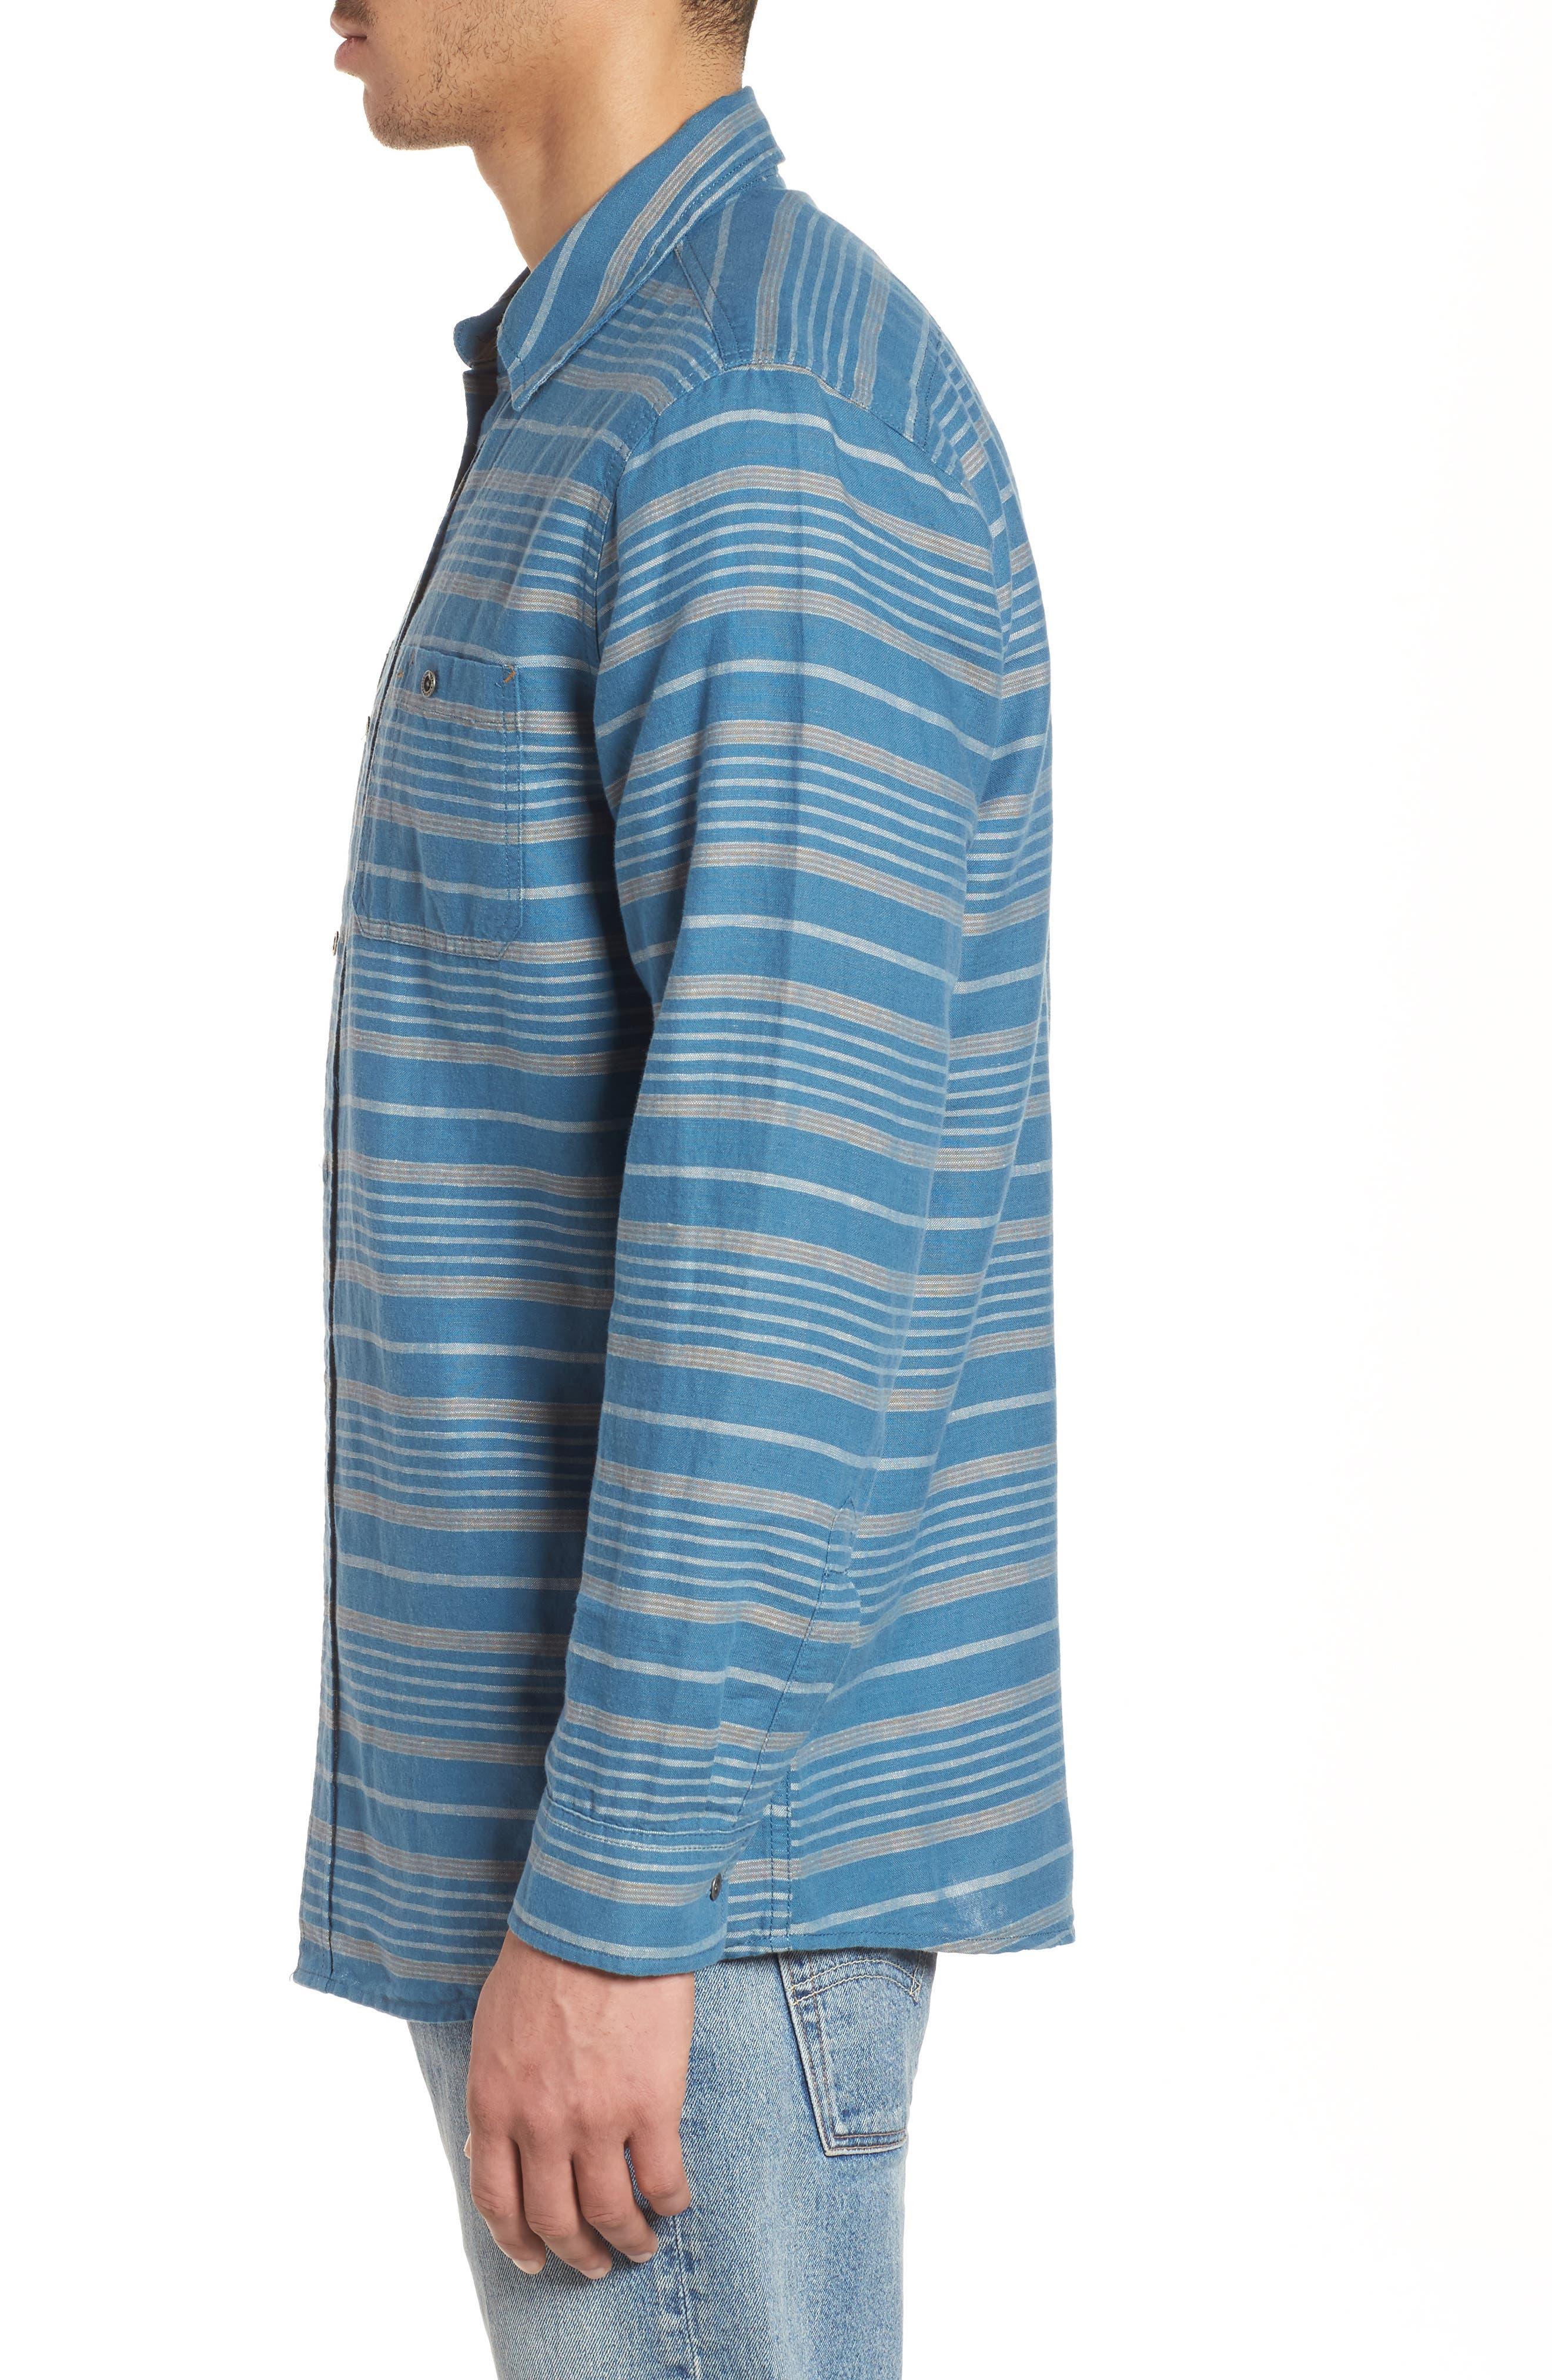 Kay Street Fitted Shirt,                             Alternate thumbnail 3, color,                             Navy/ Cream Stripe